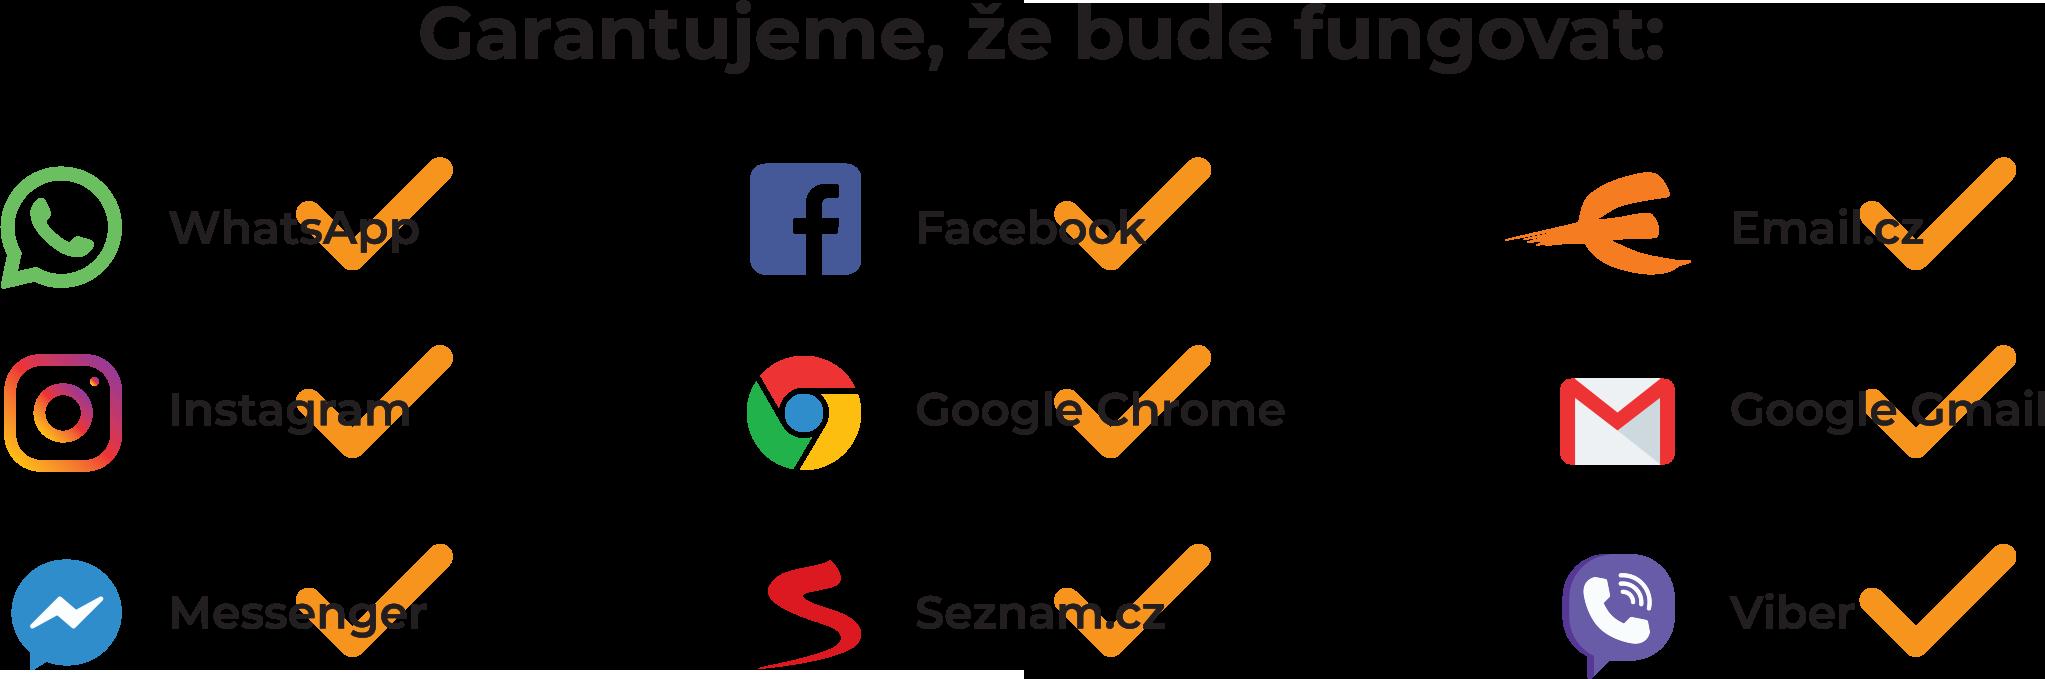 garance_aplikace